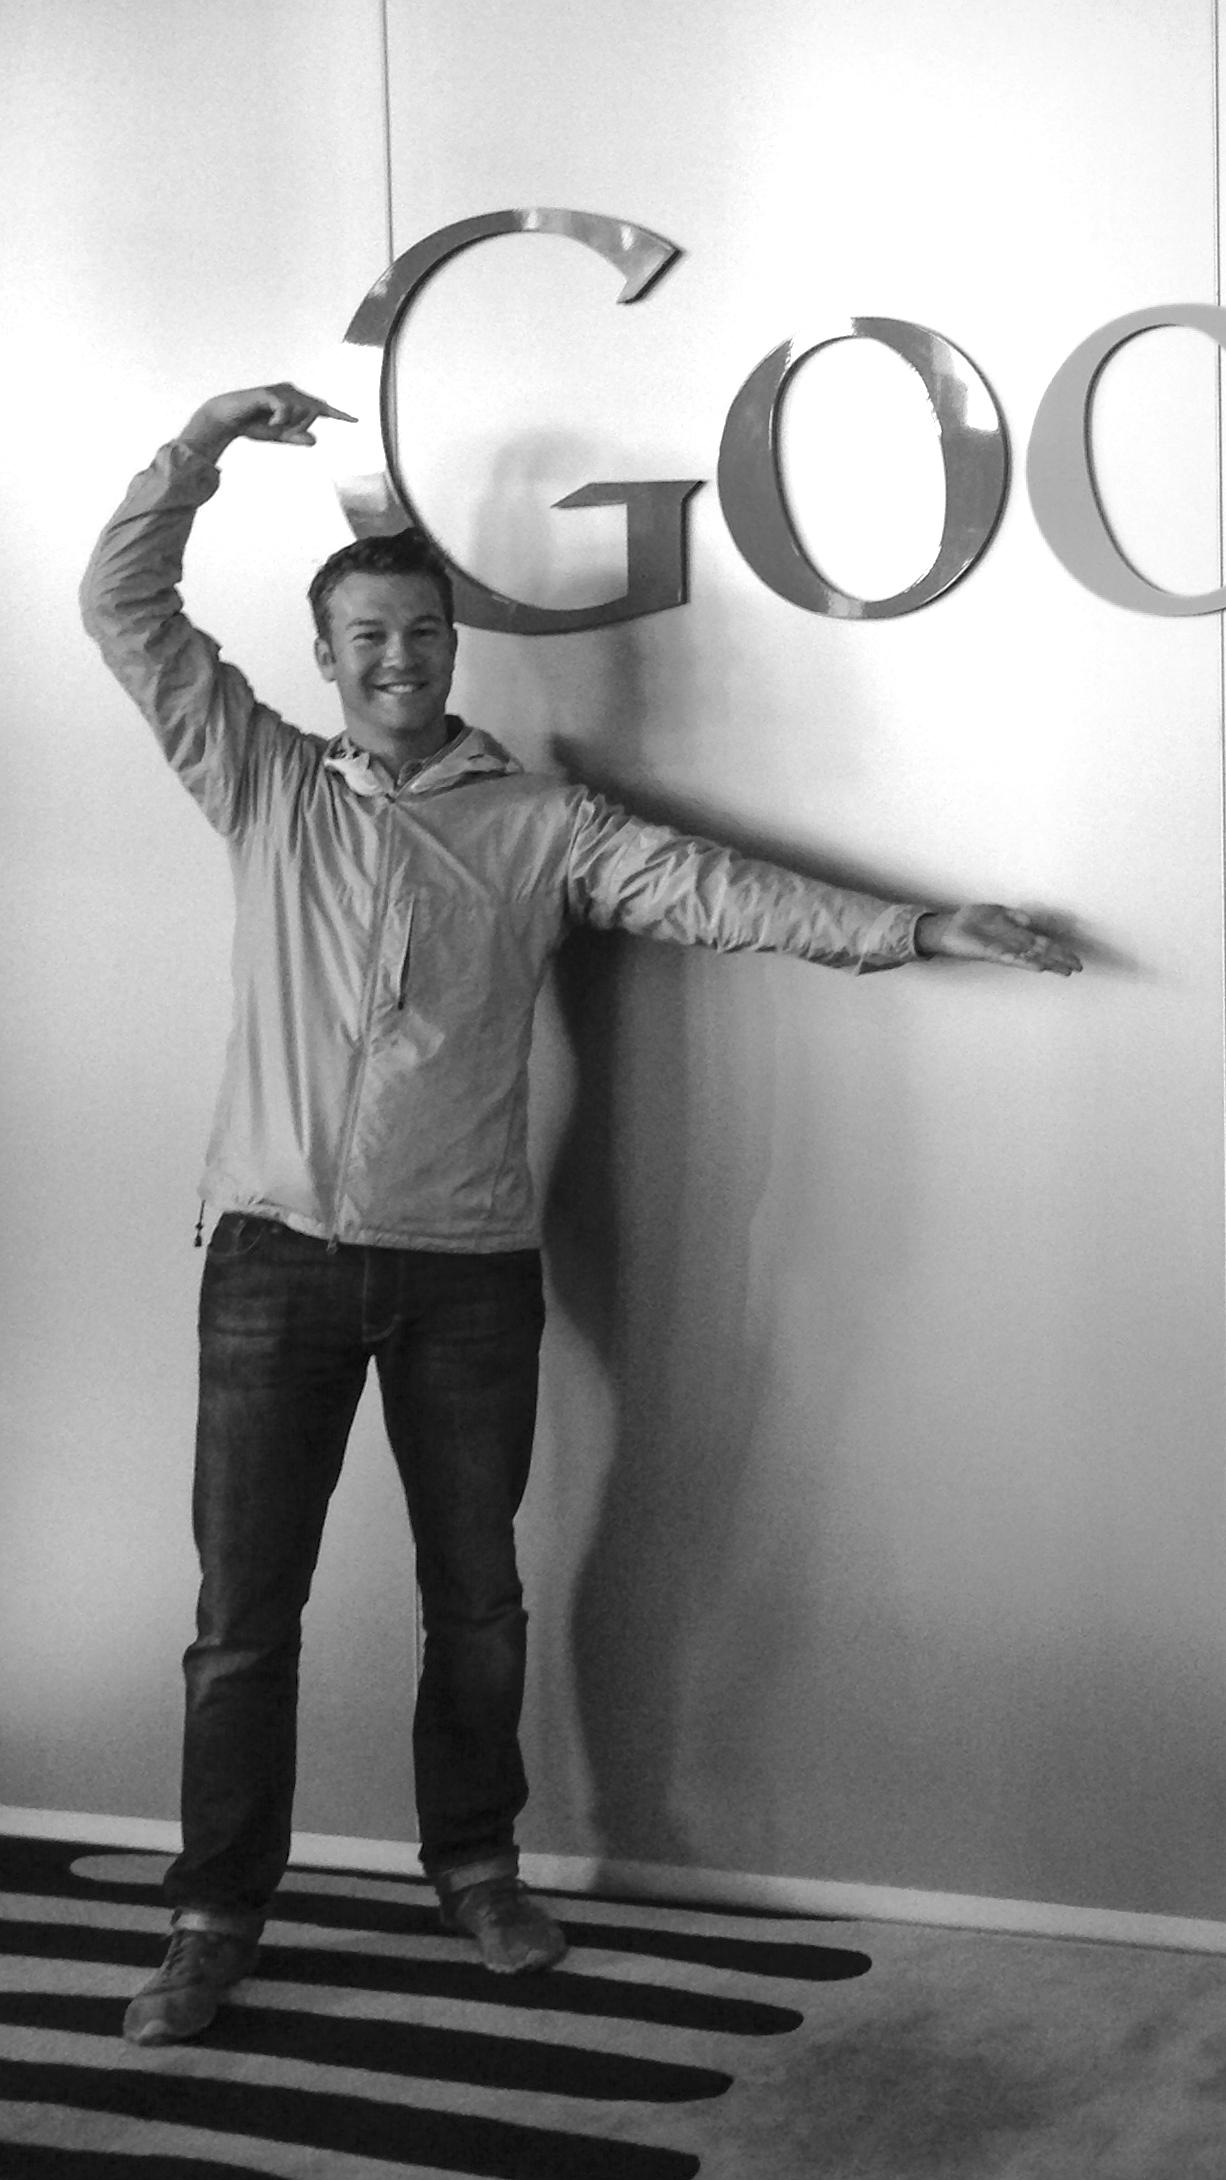 Brian Hamm, Co-Founder